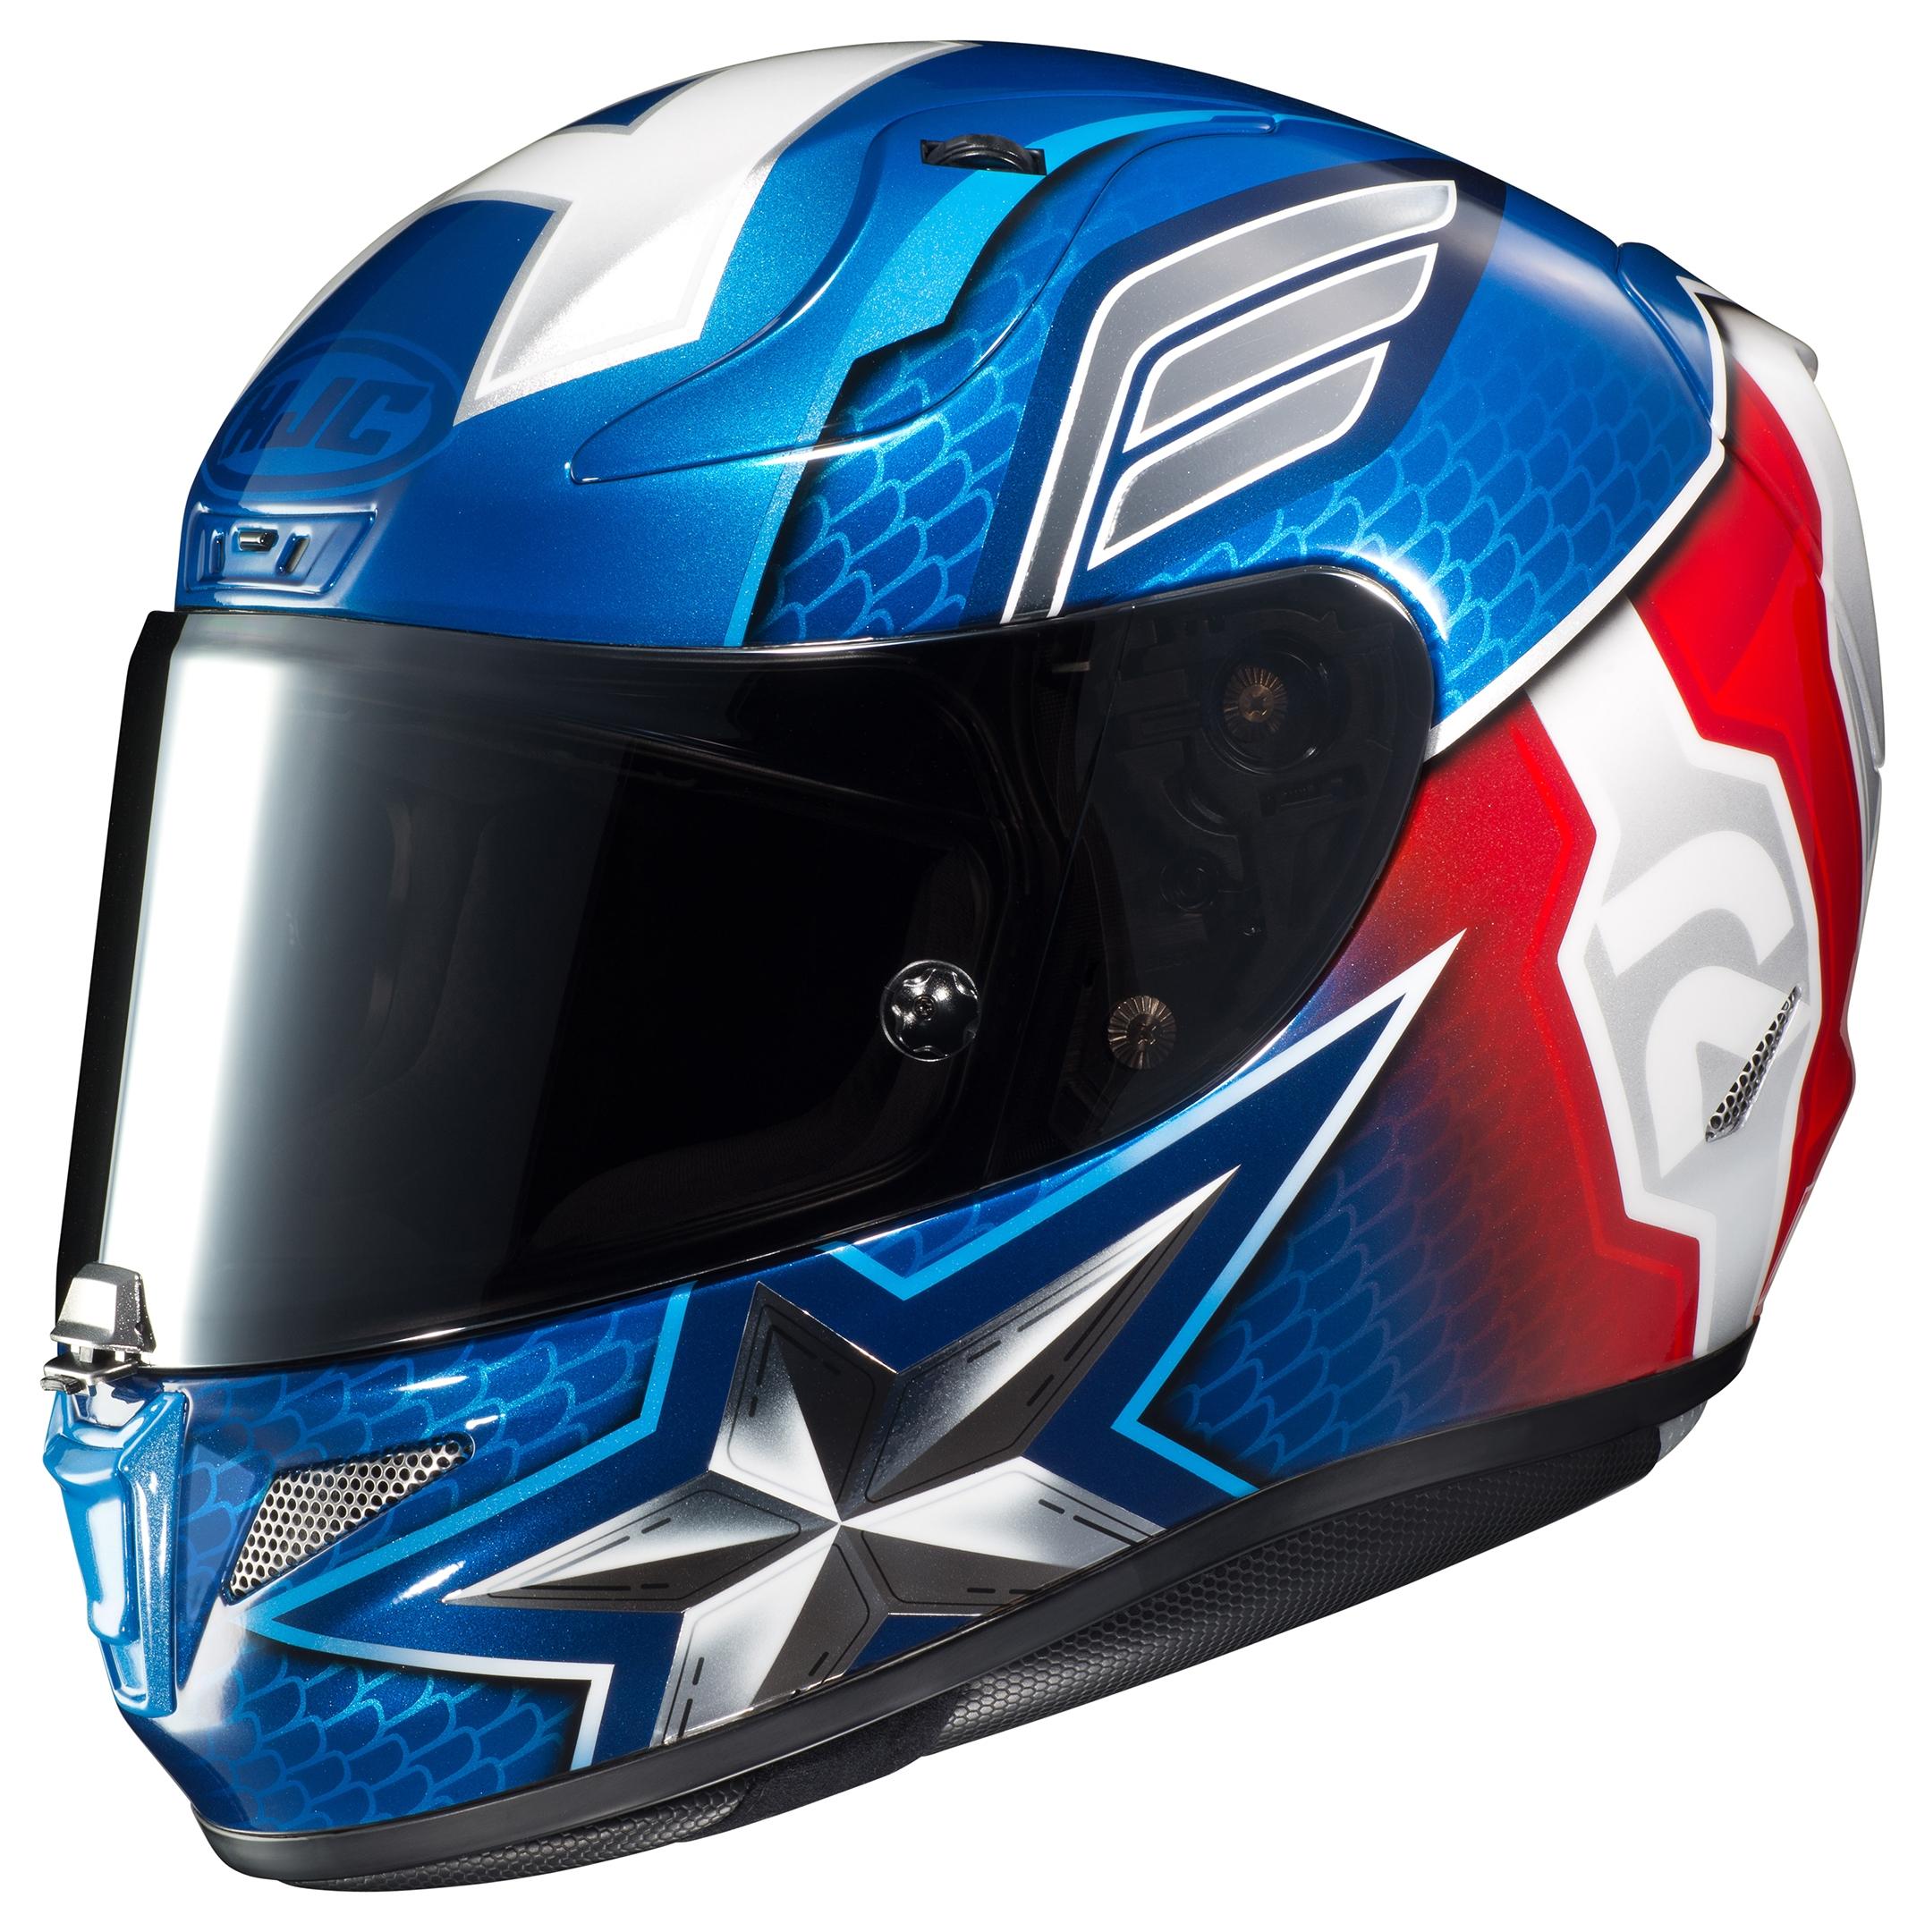 Hjc Rpha 11 >> HJC RPHA 11 Pro Captain America Helmet - Cycle Gear